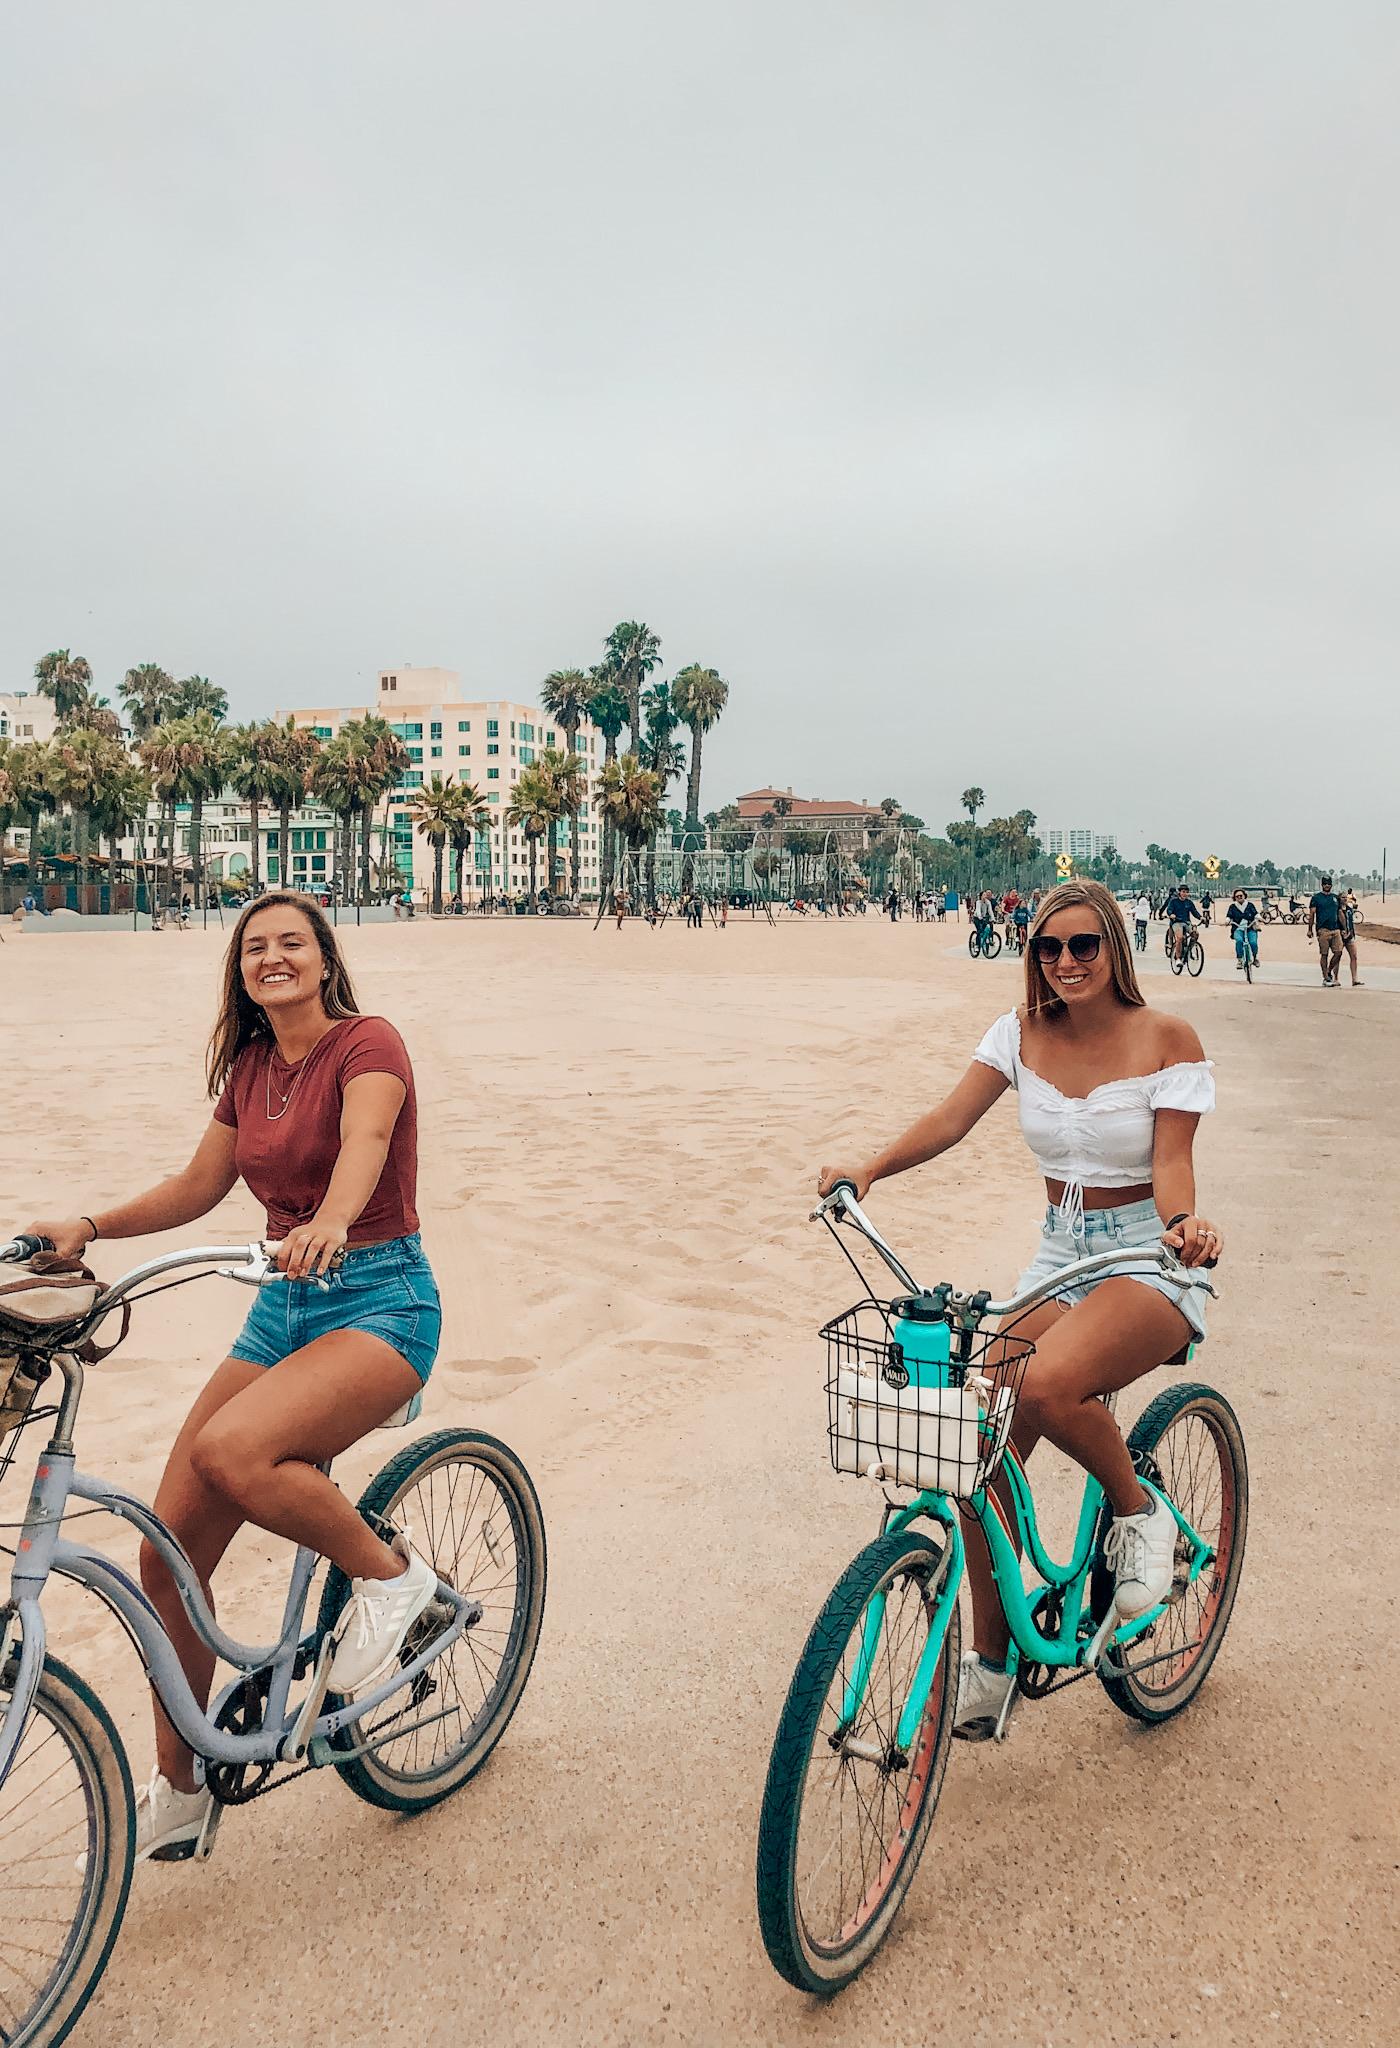 Biking from Venice Beach to Santa Monica Pier!